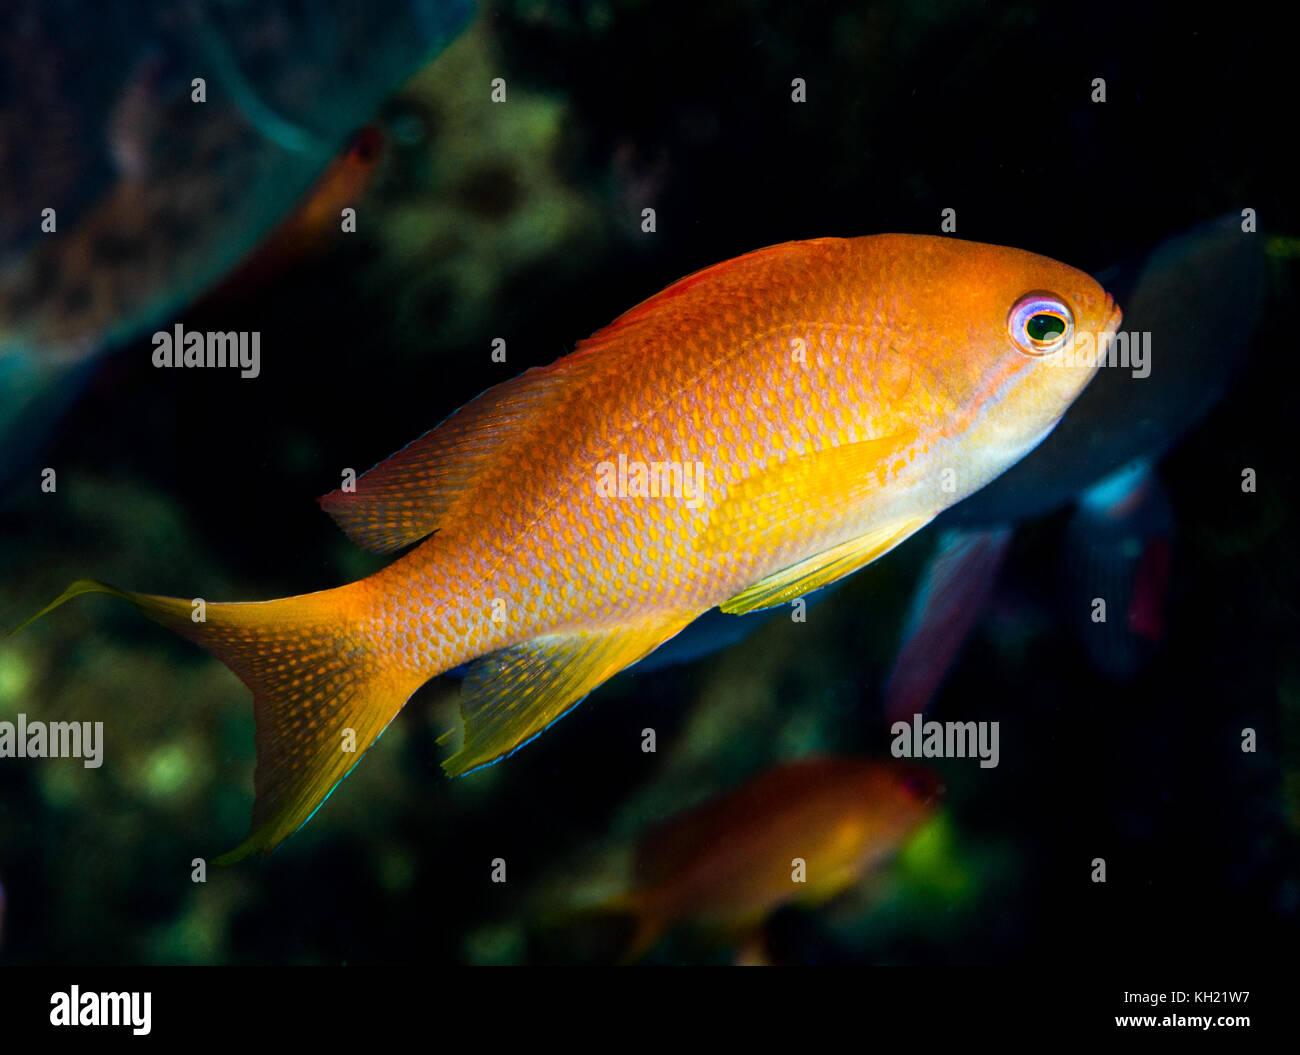 female luzon anthias fish - Stock Image